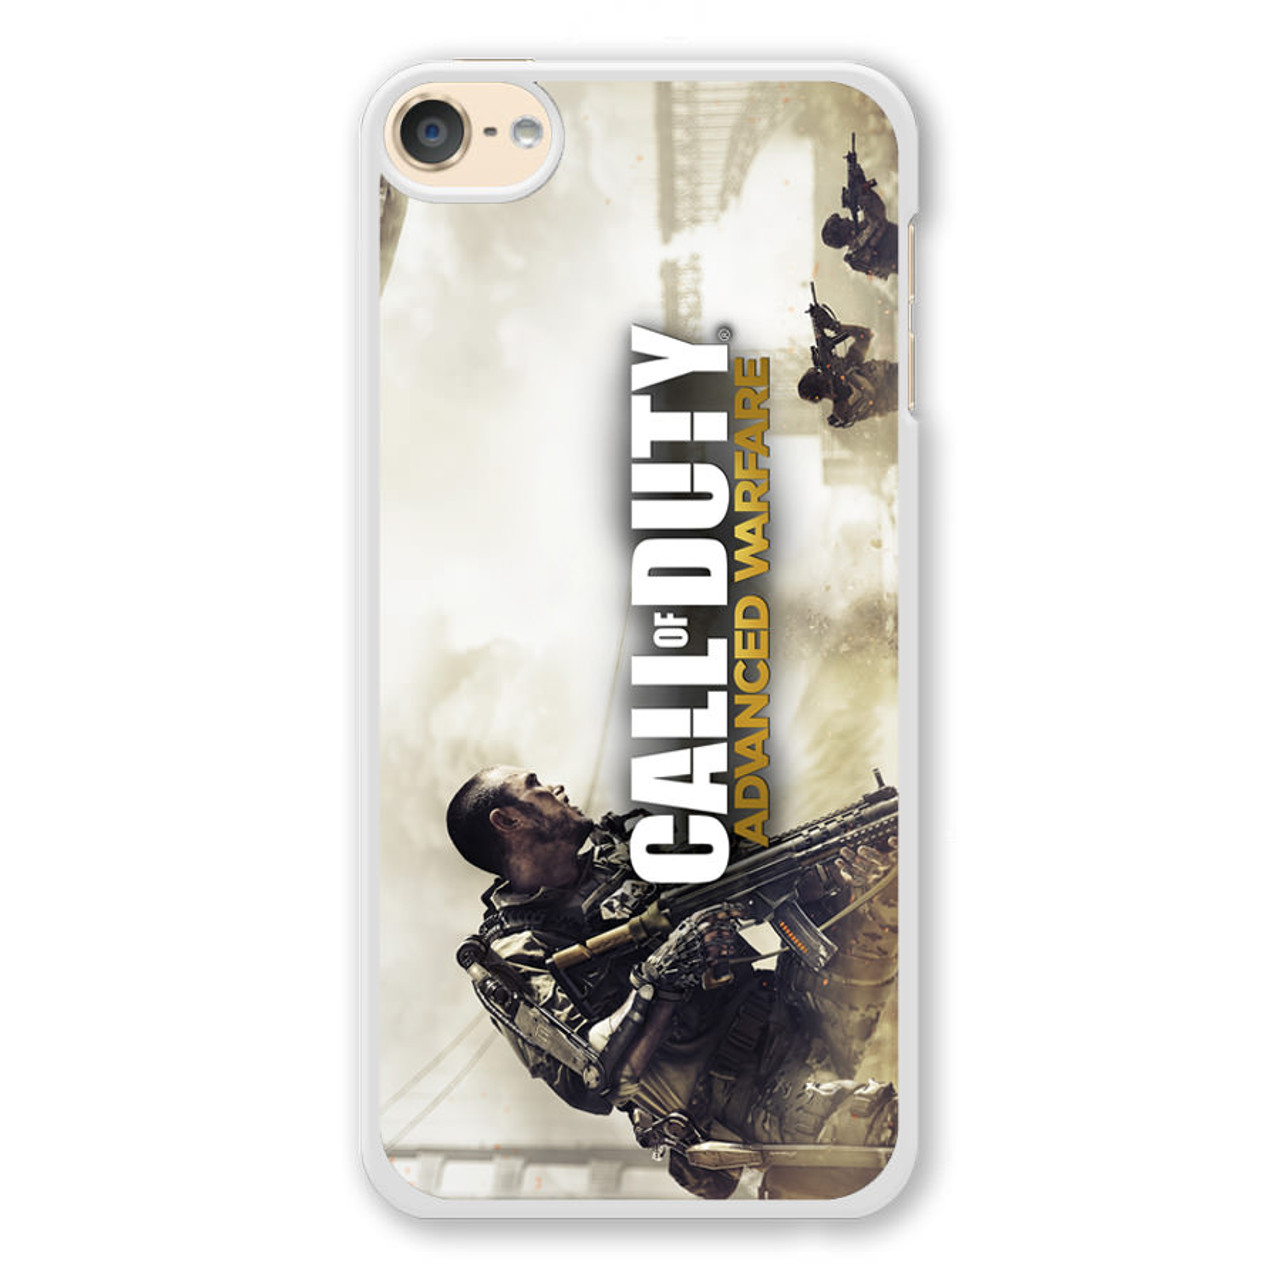 Call of Duty Advanced Warfare iphone case